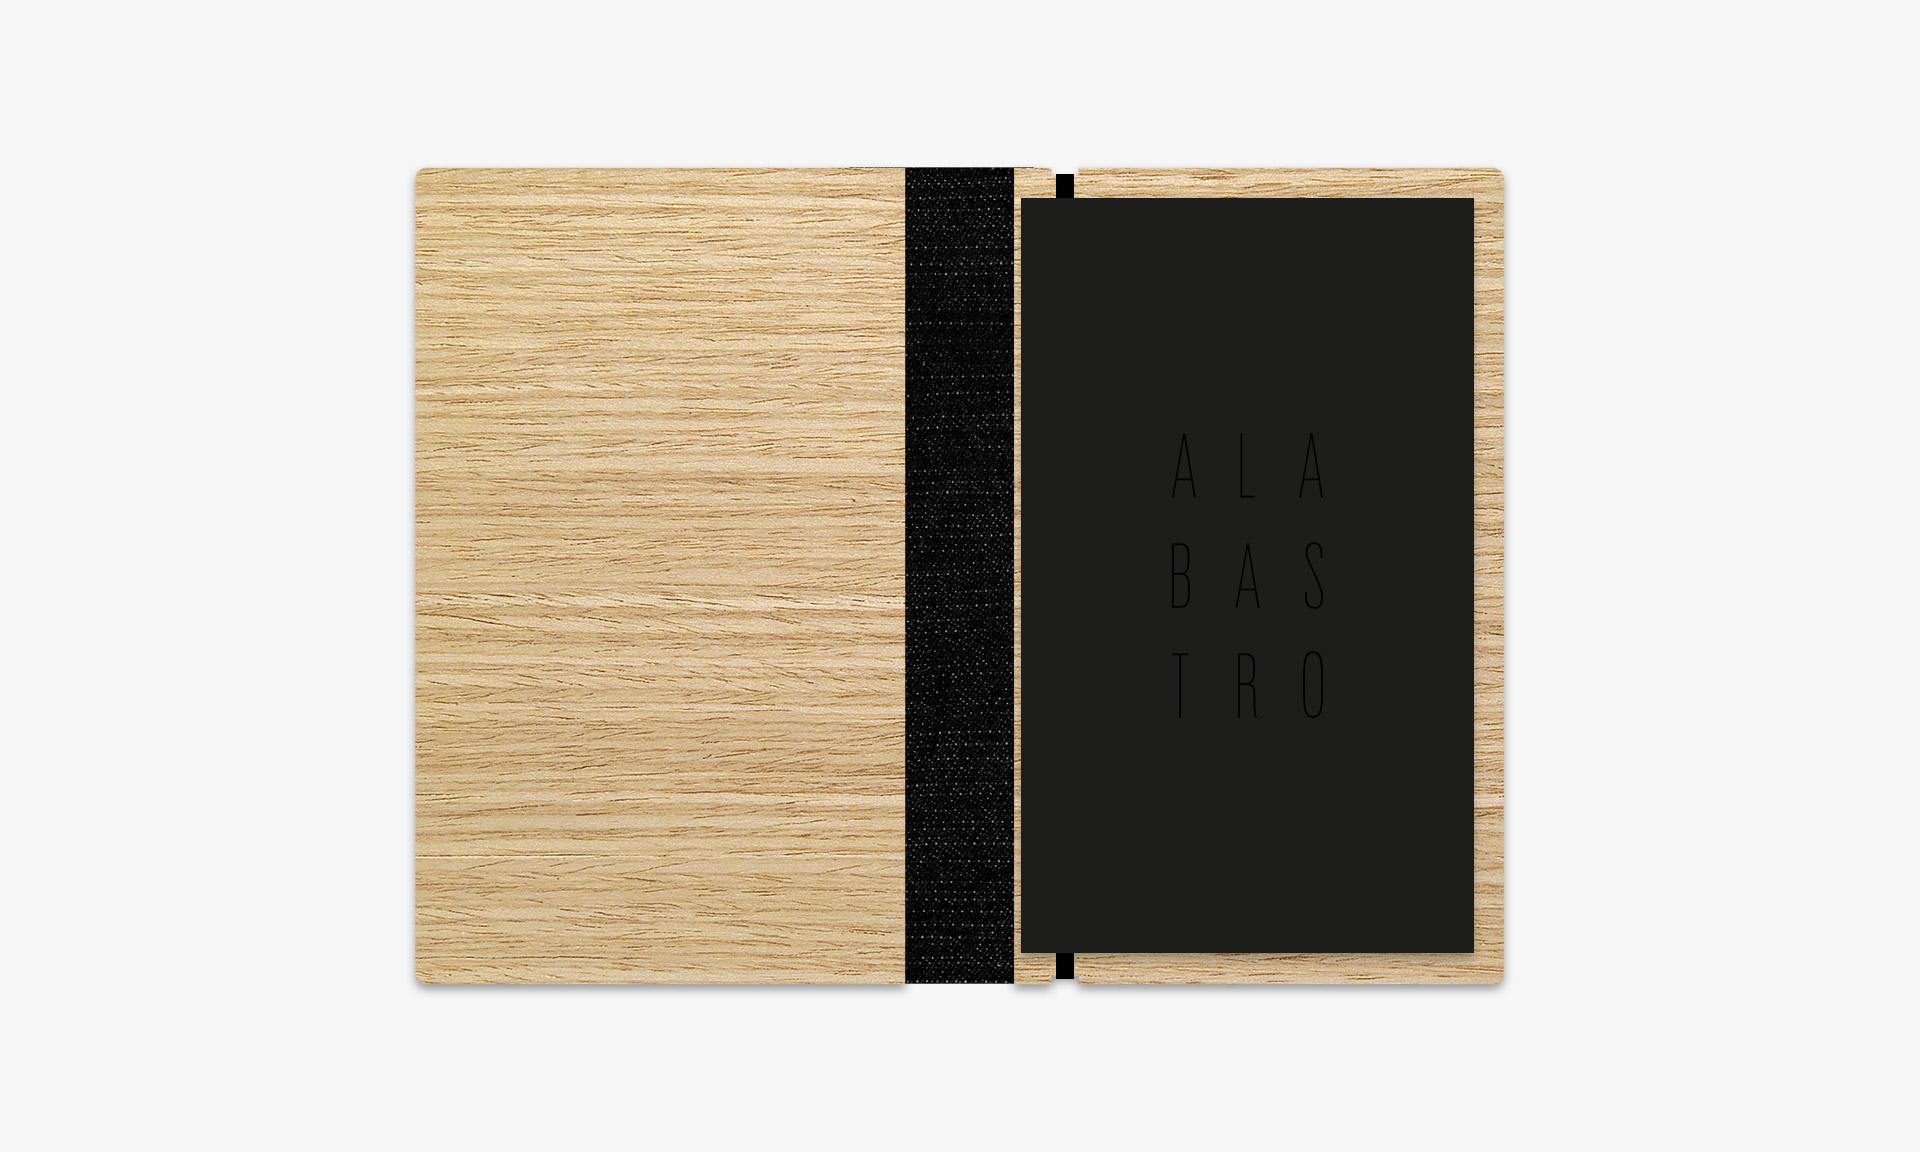 Aguas de Ibiza cartas Alabastro detalle interior negro